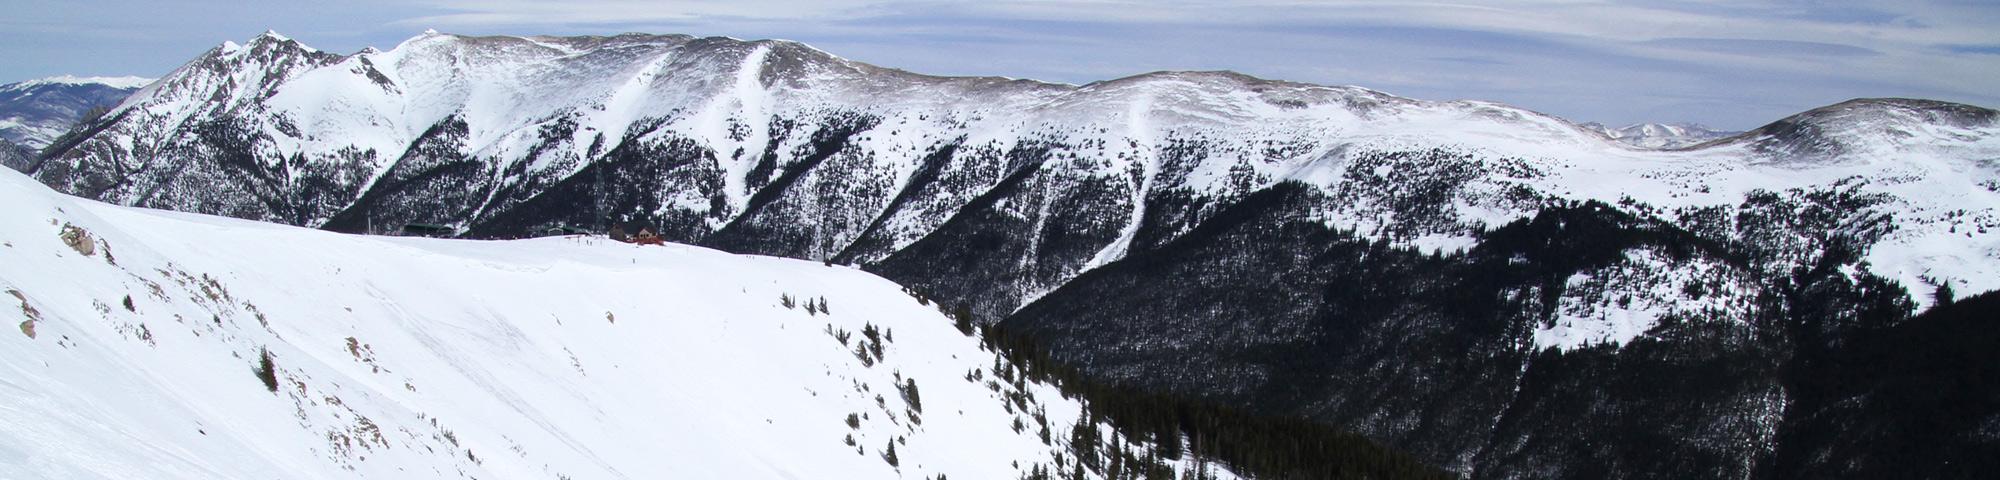 The 10 Best Colorado Ski Resorts Updated 2020 21 Snowpak